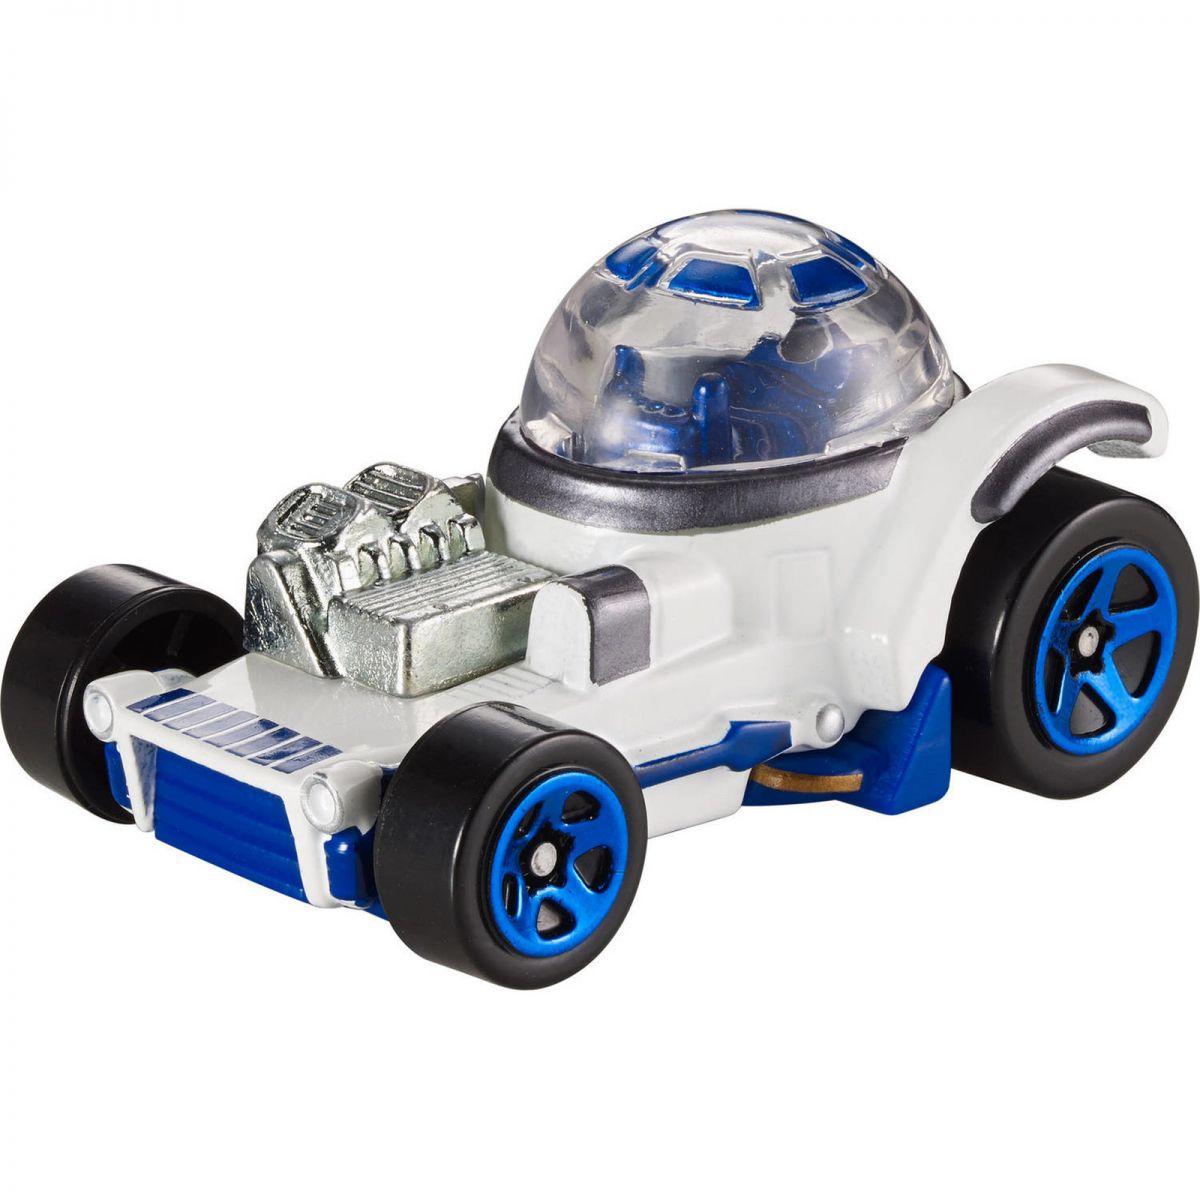 Star Wars: R2-D2 - Hot Wheels